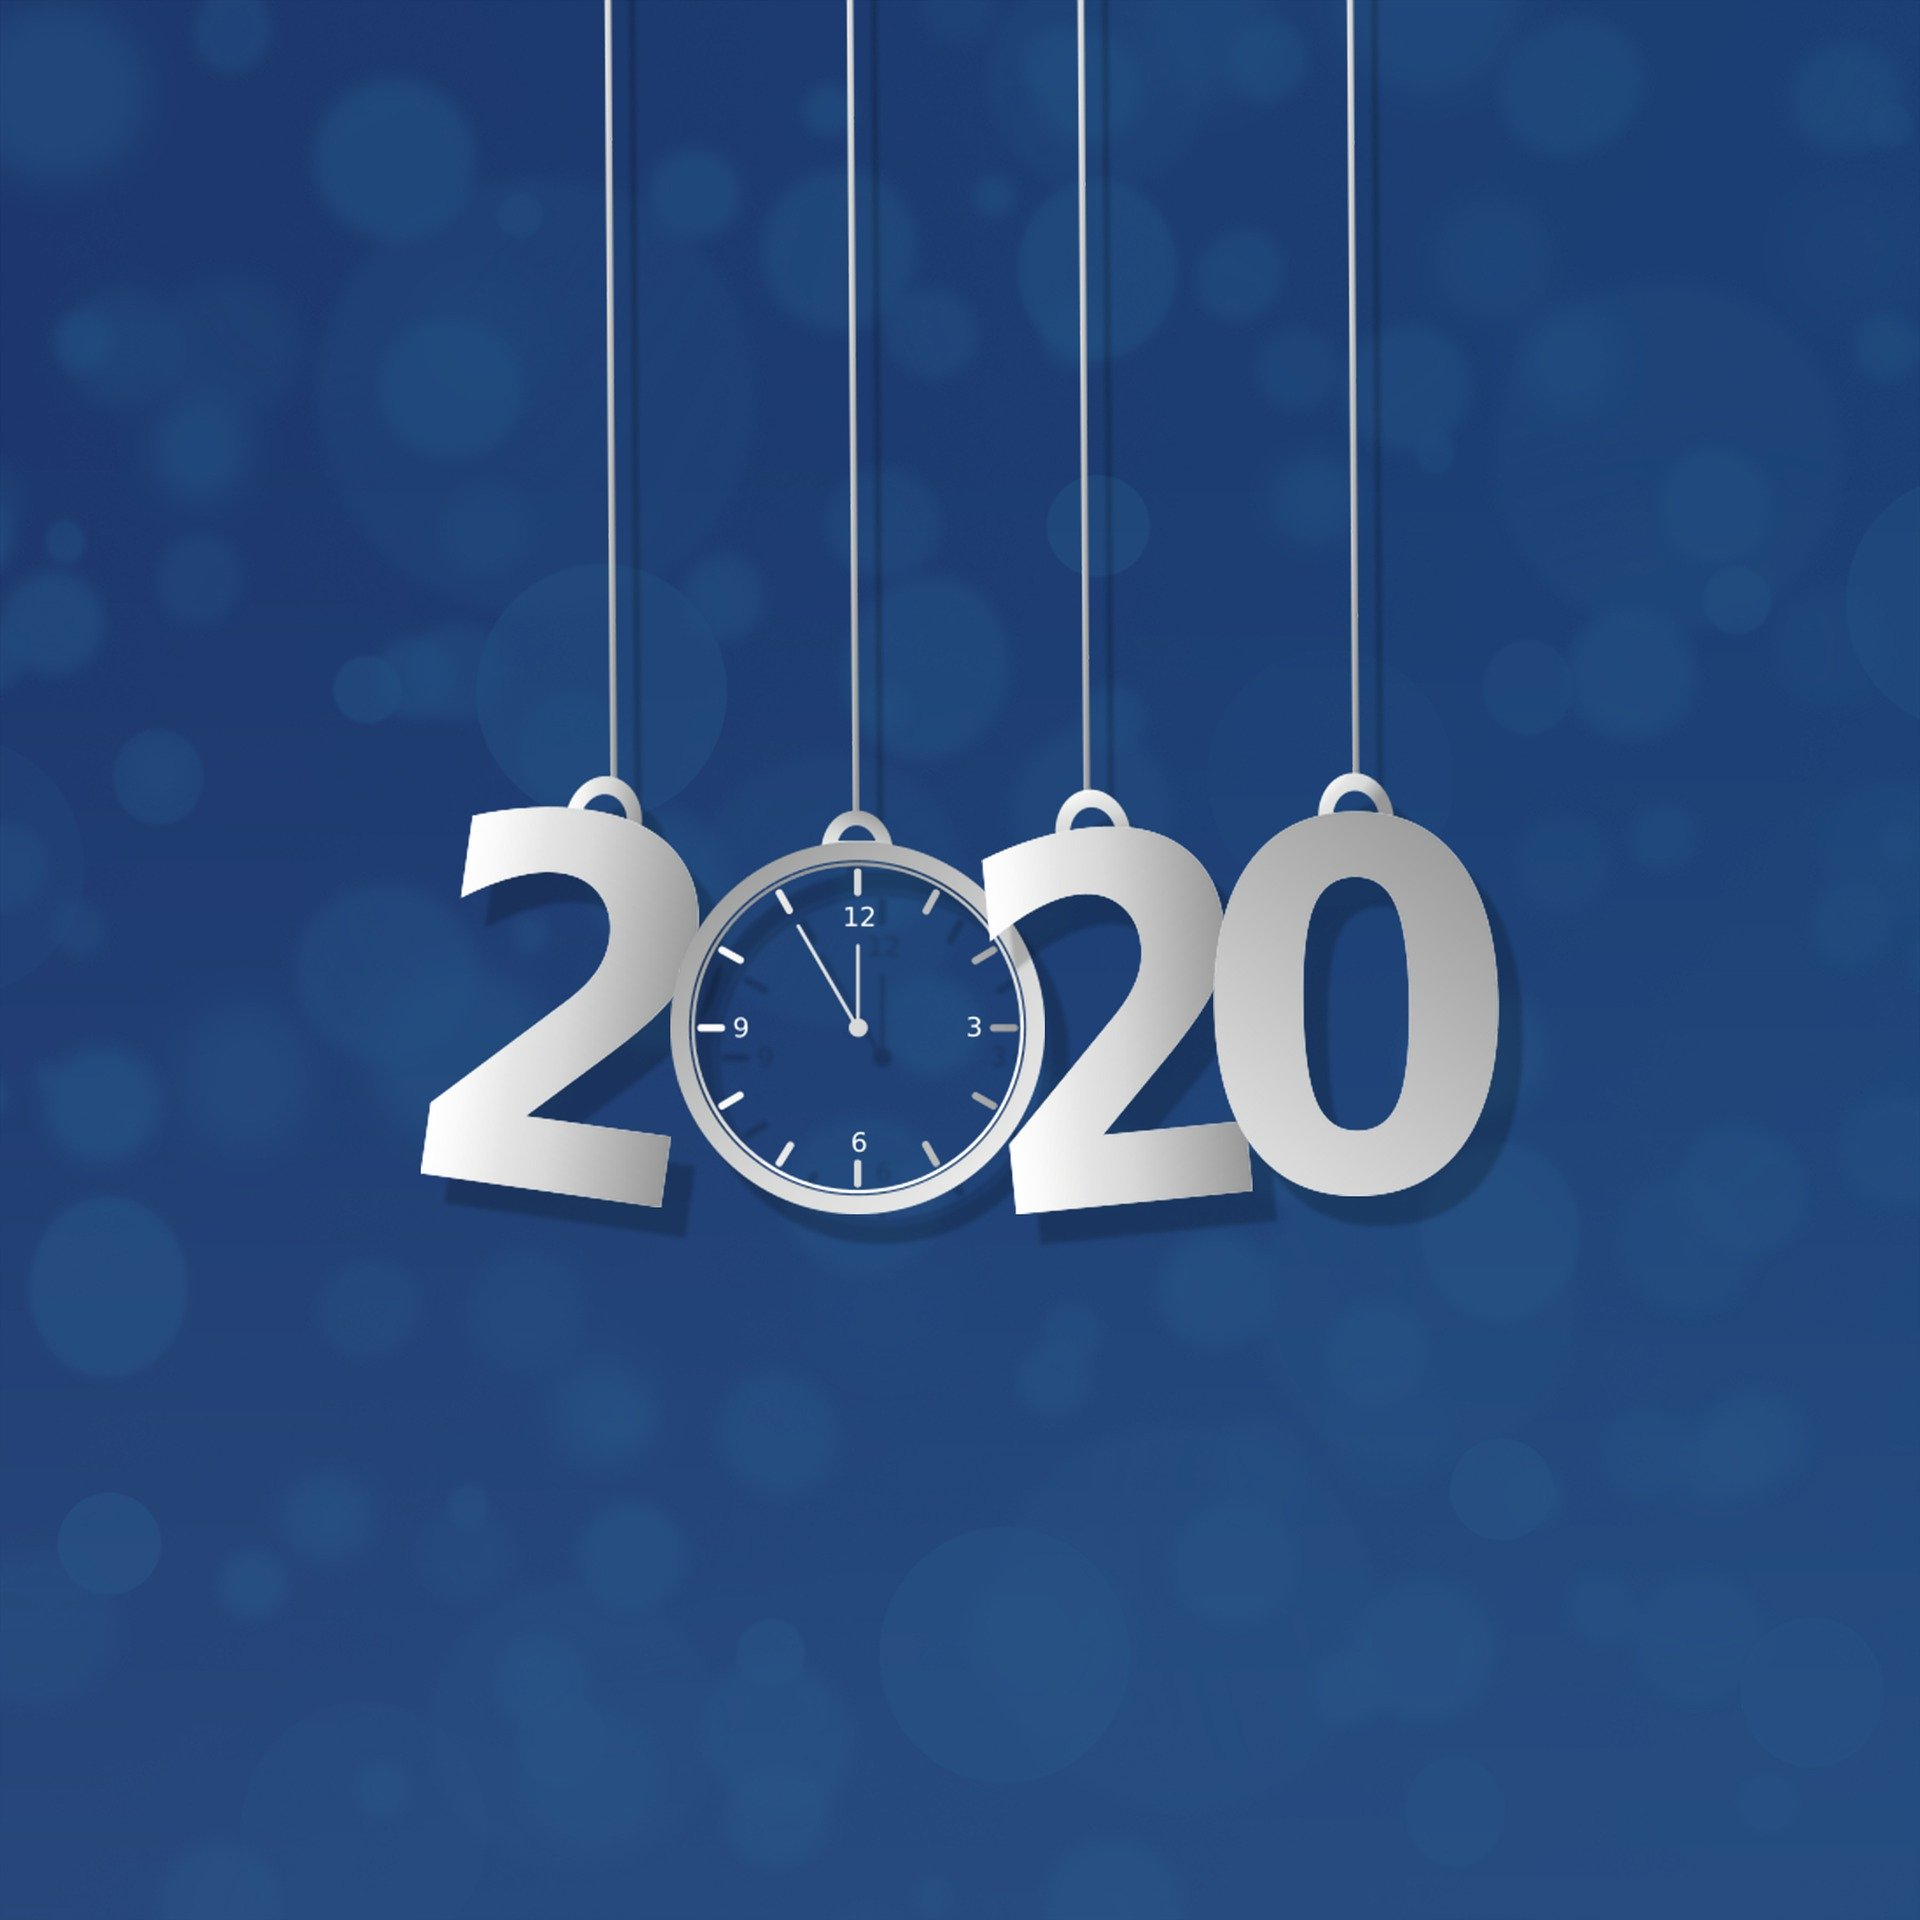 2020 blu